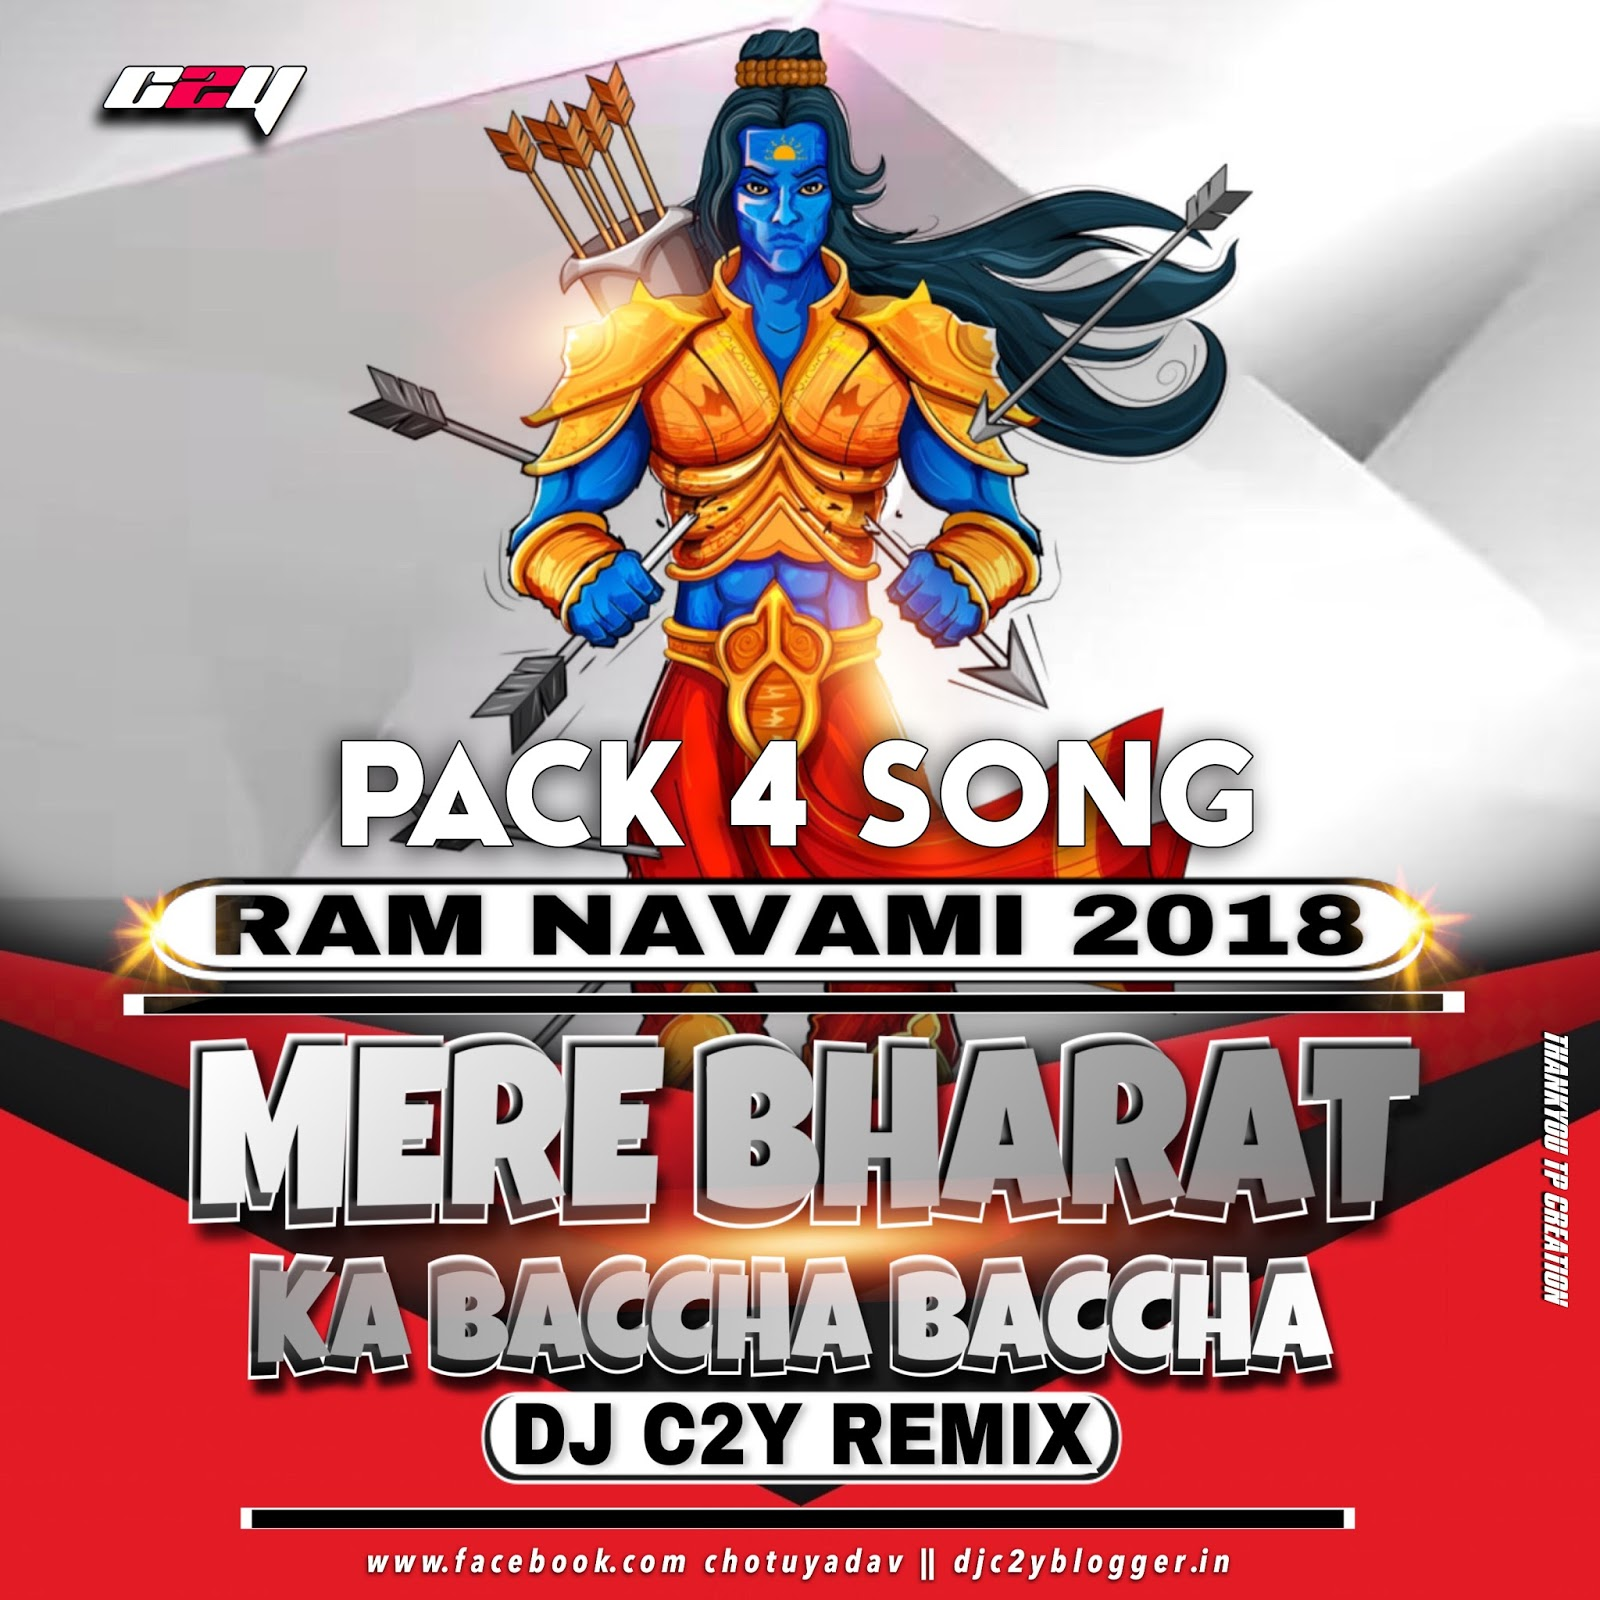 Bhagwa Rang Dj: RAMNAVMI SPECIAL PACK 4 SONG 2018 DJ C2Y